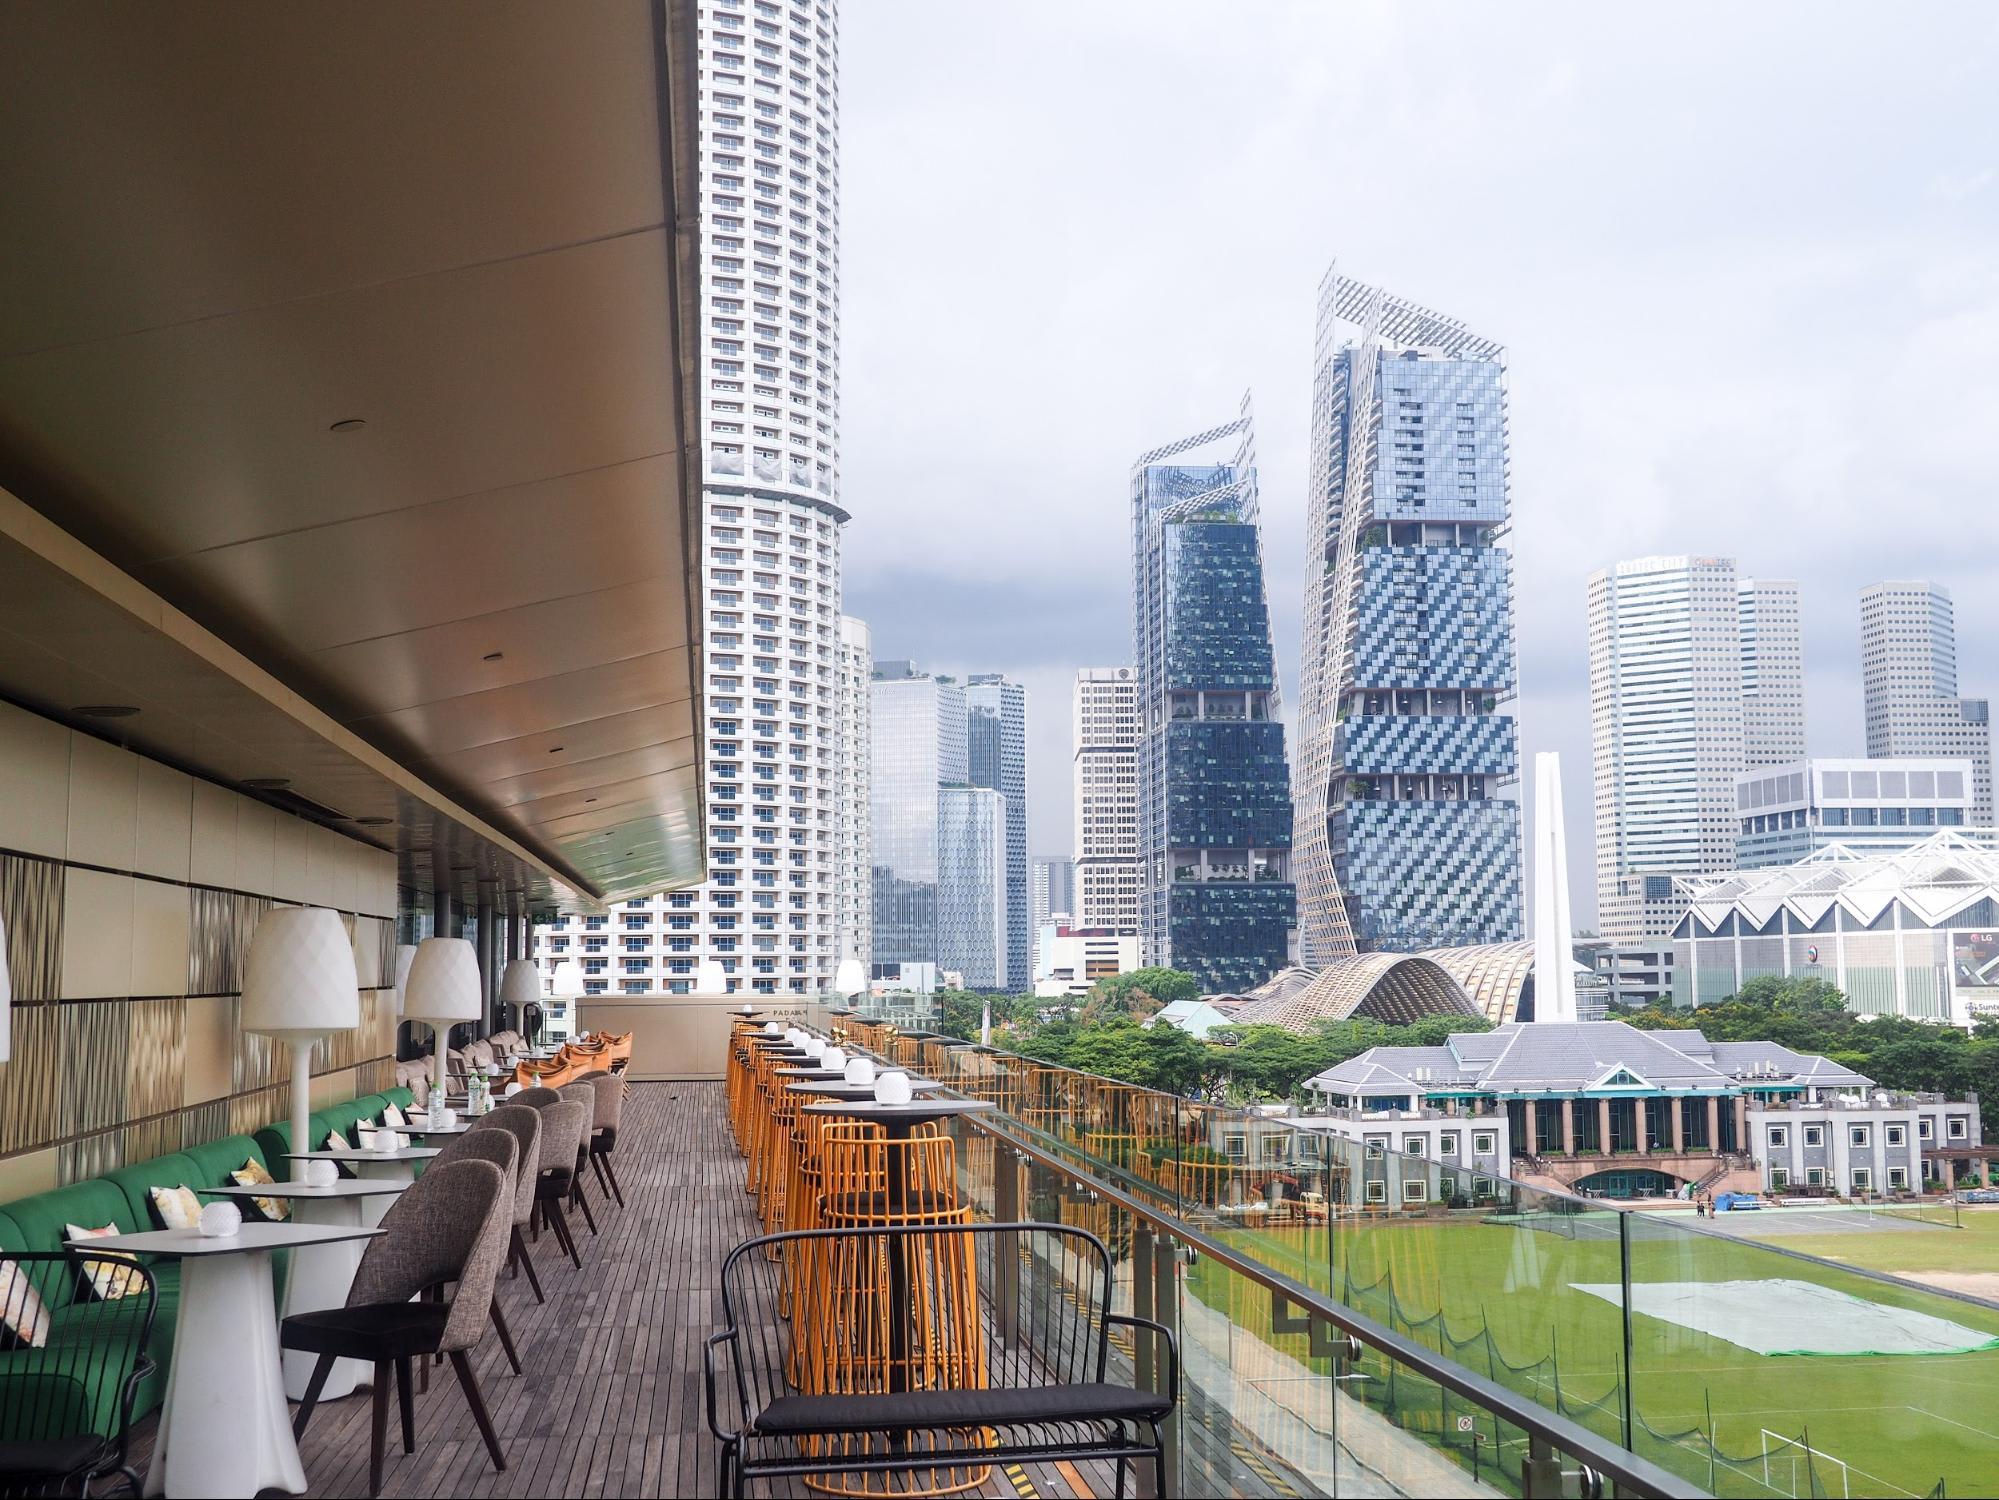 marina bay sands singapore 11 noi nhat dinh phai den6